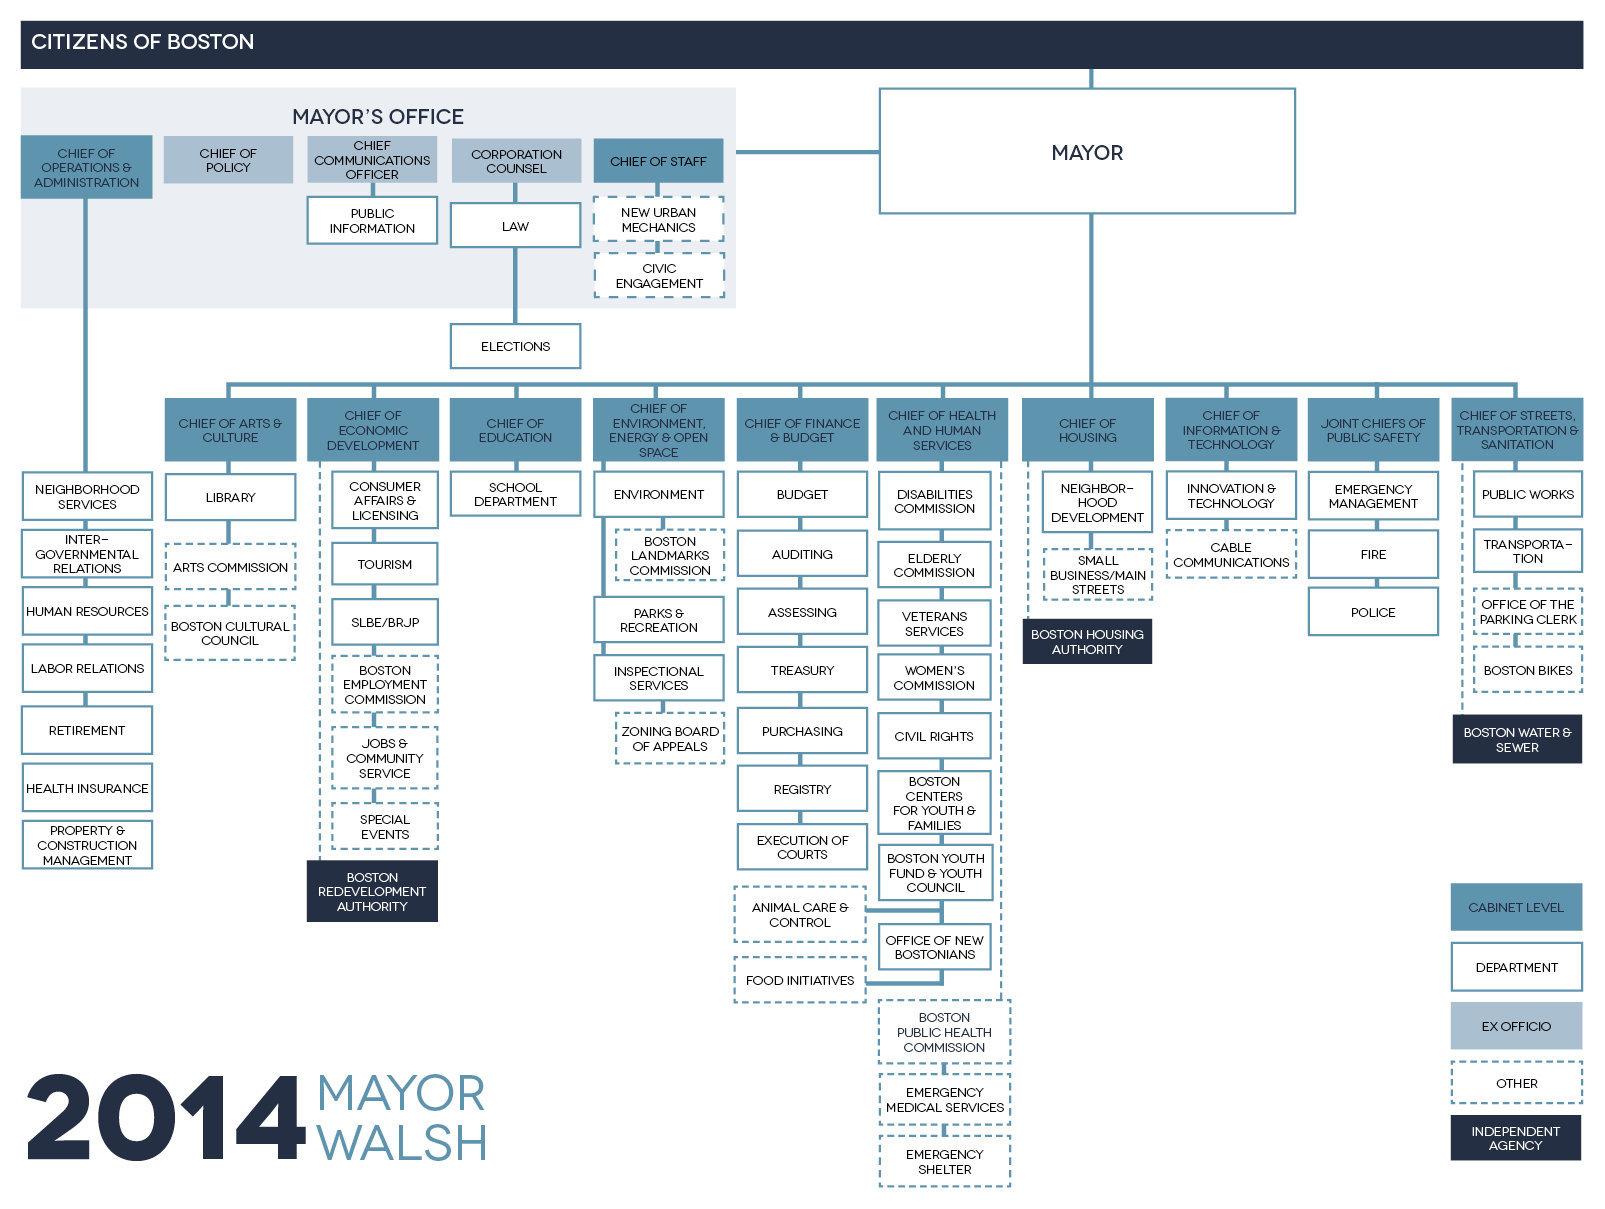 mayoral_cabinet.jpg